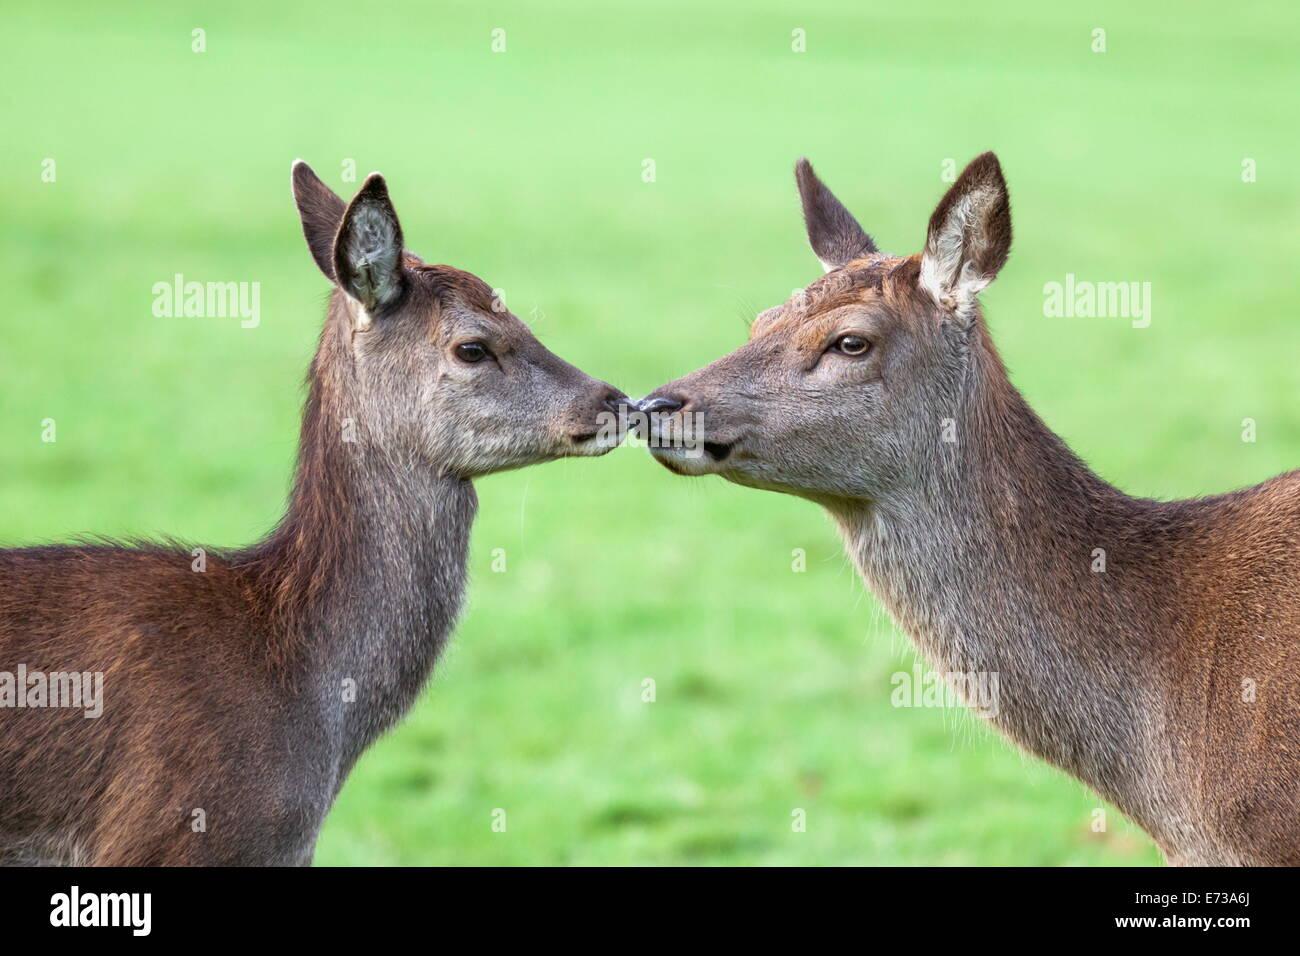 Red deer hind with young (Cervus elaphus), Arran, Scotland, United Kingdom, Europe - Stock Image